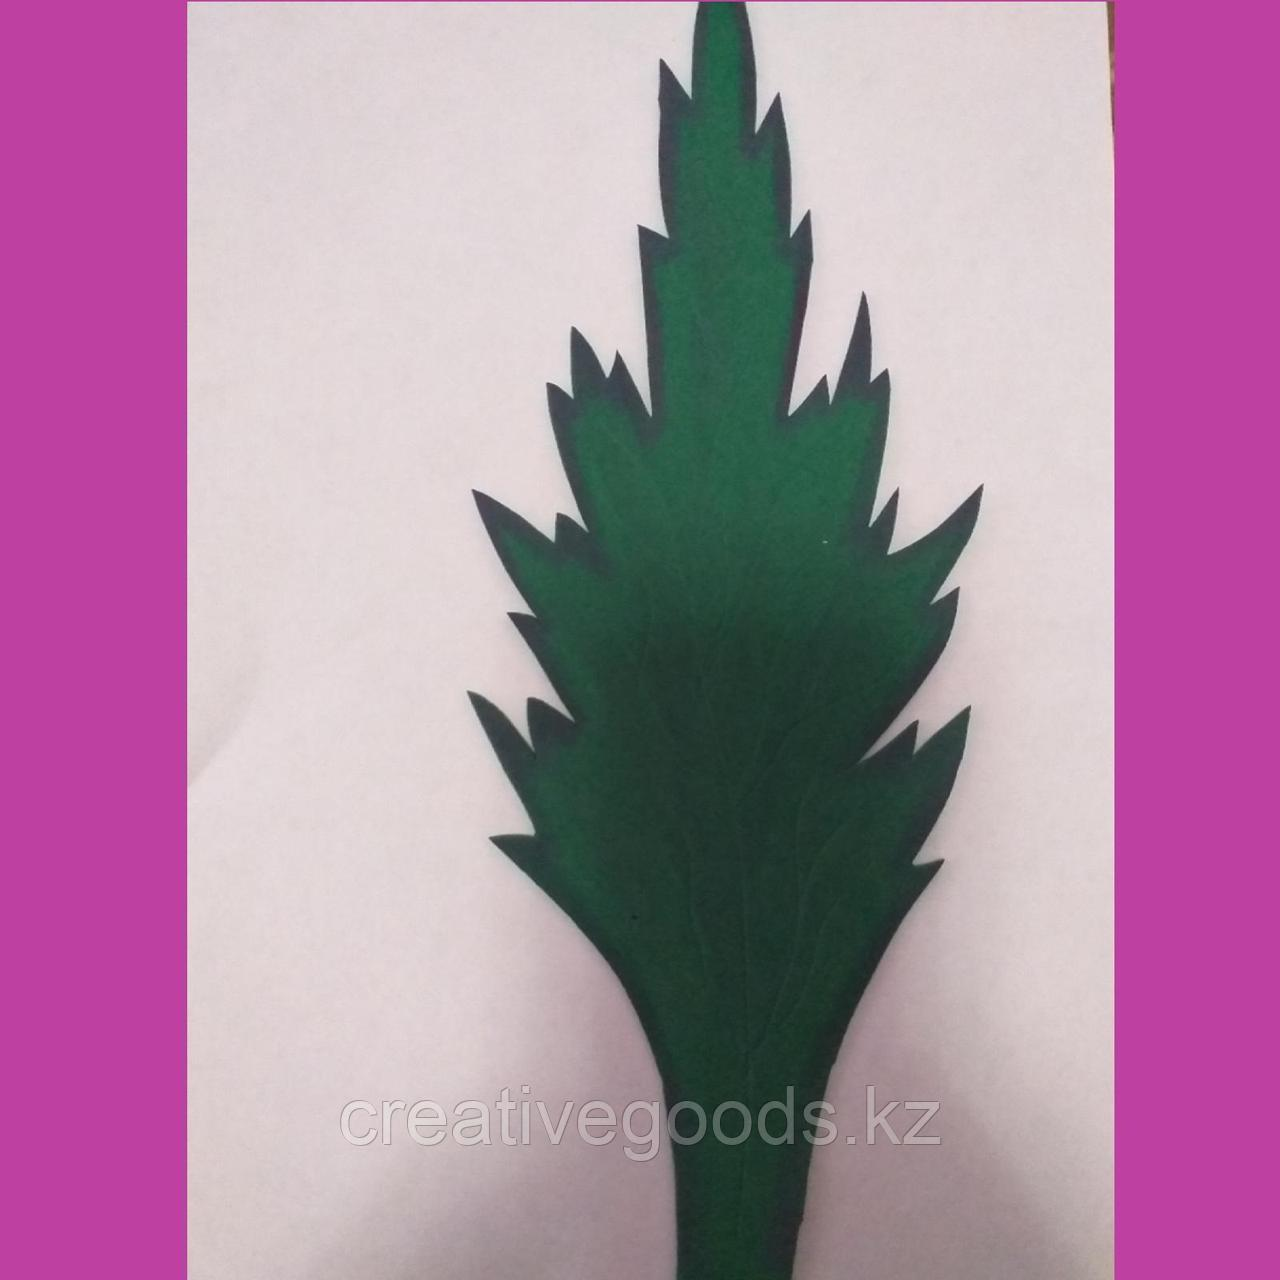 Лист из фоамирана. Размер: 30 * 11 см.  Creativ  2734